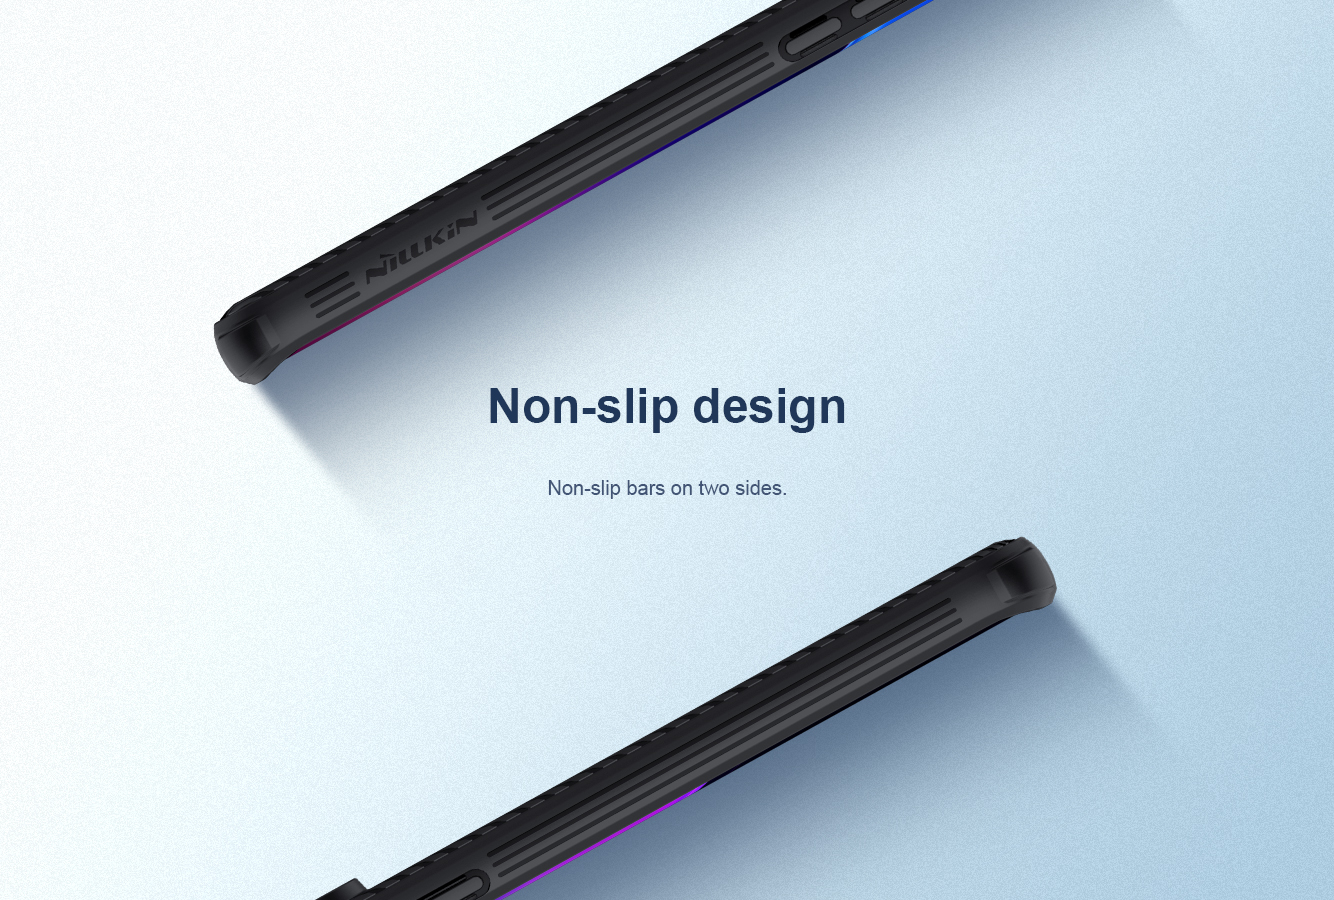 OnePlus_9_Pro_CamShield_Pro_Case-06.jpg